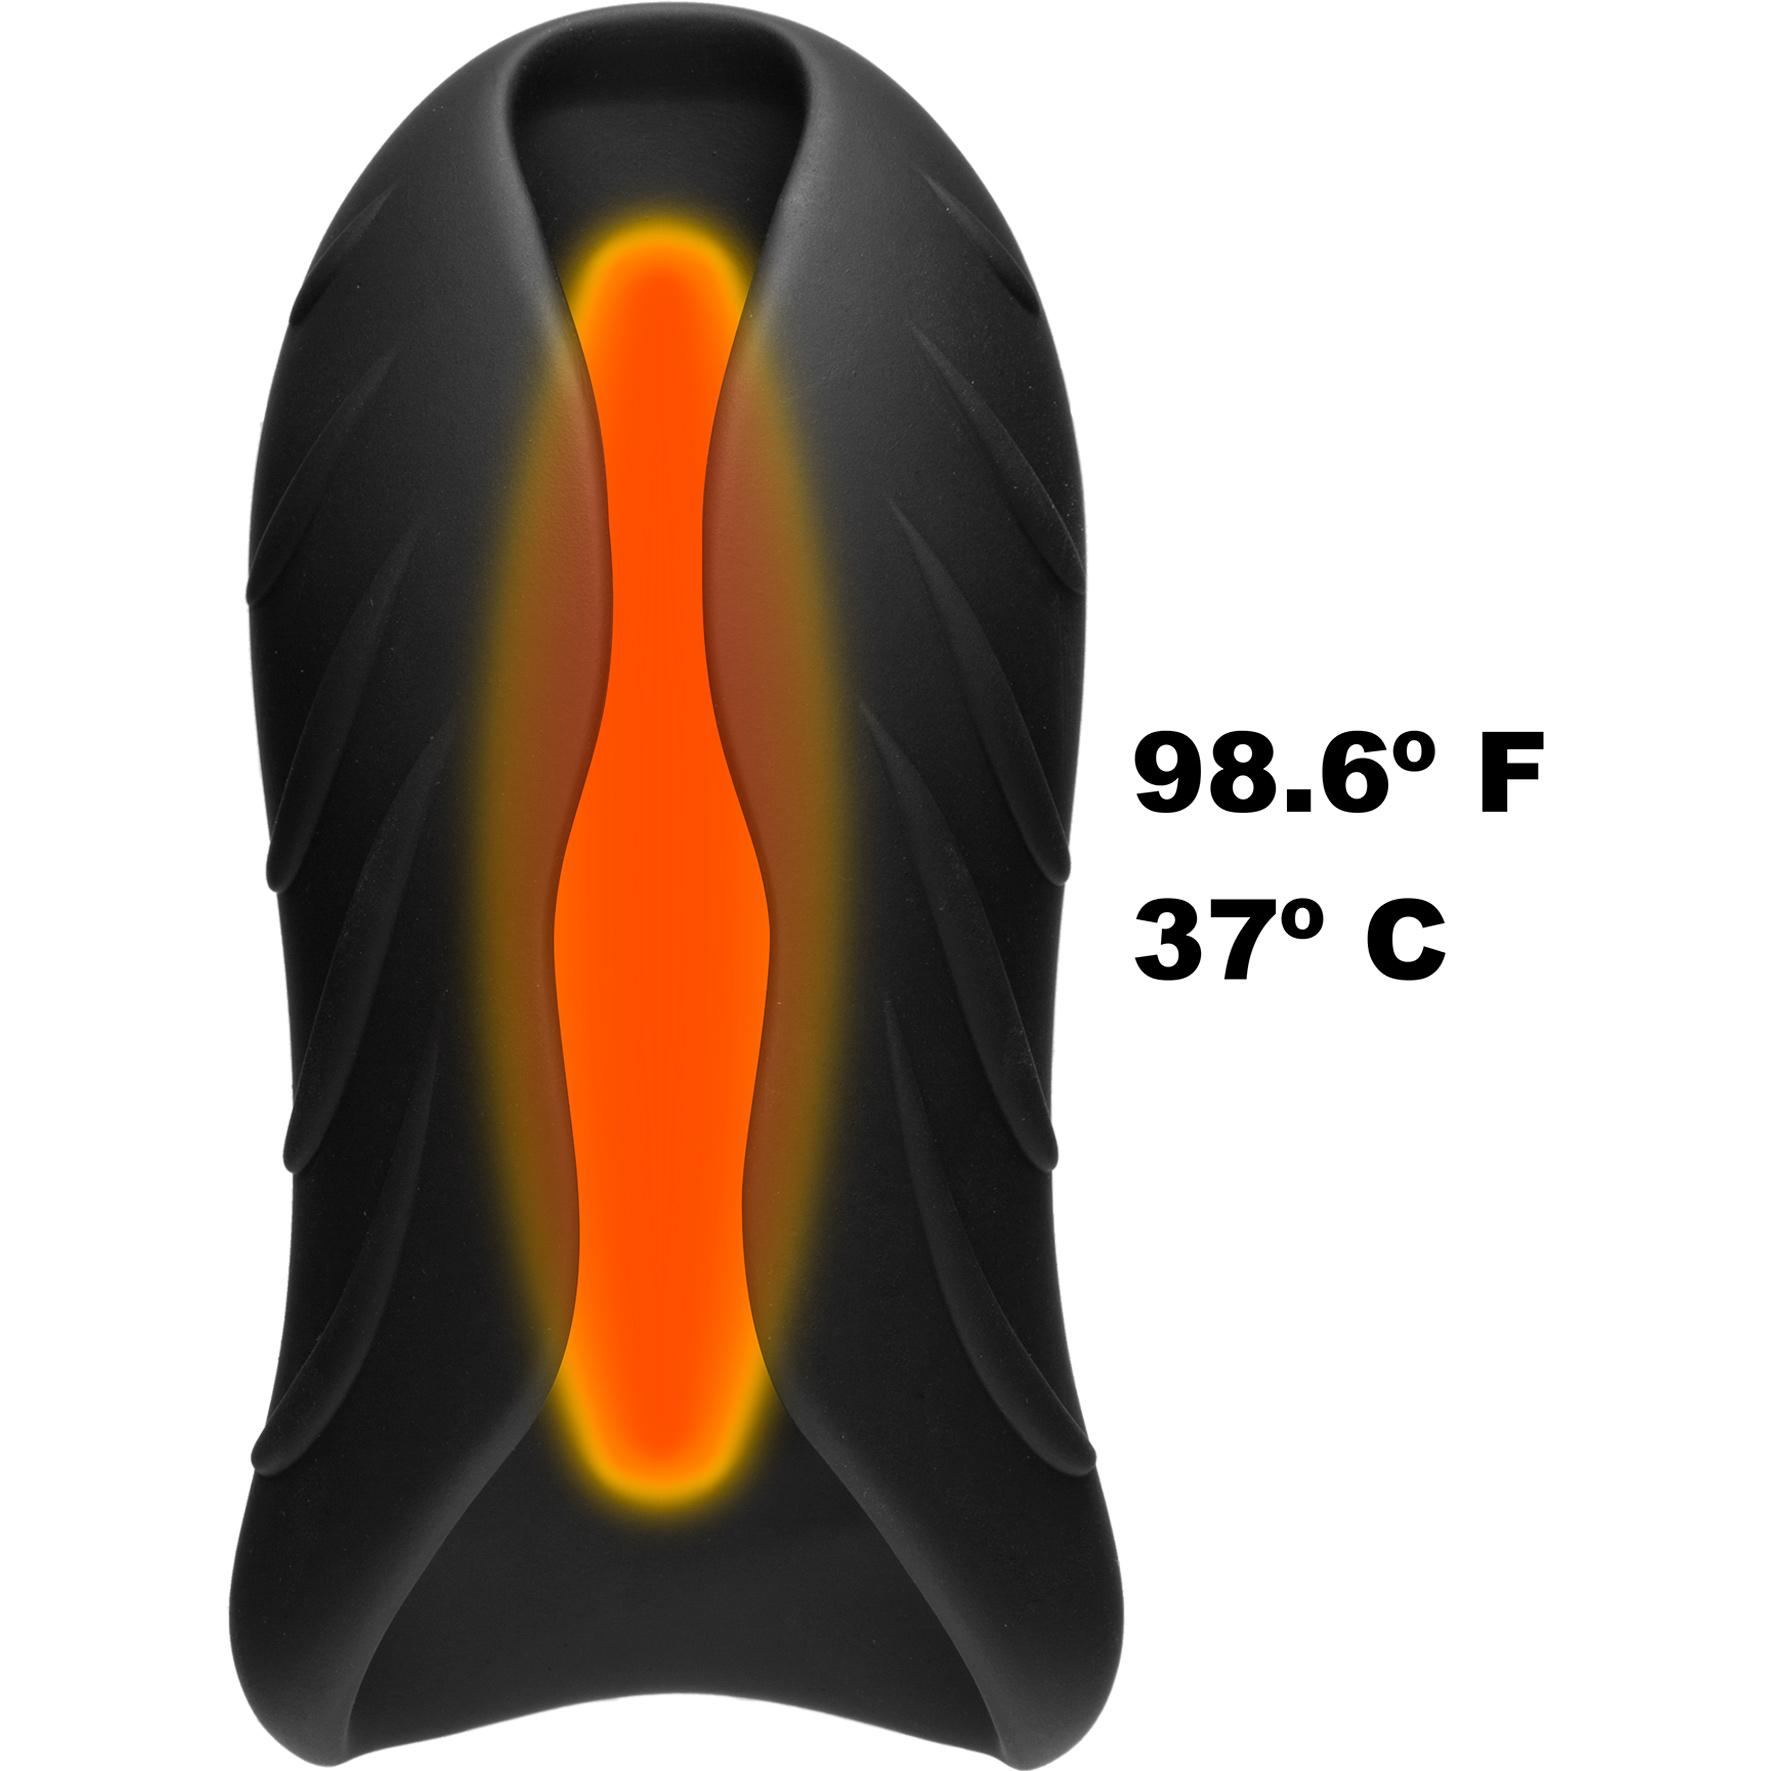 OptiMALE SECONDSKYN Silicone Warming Stroker - Warming